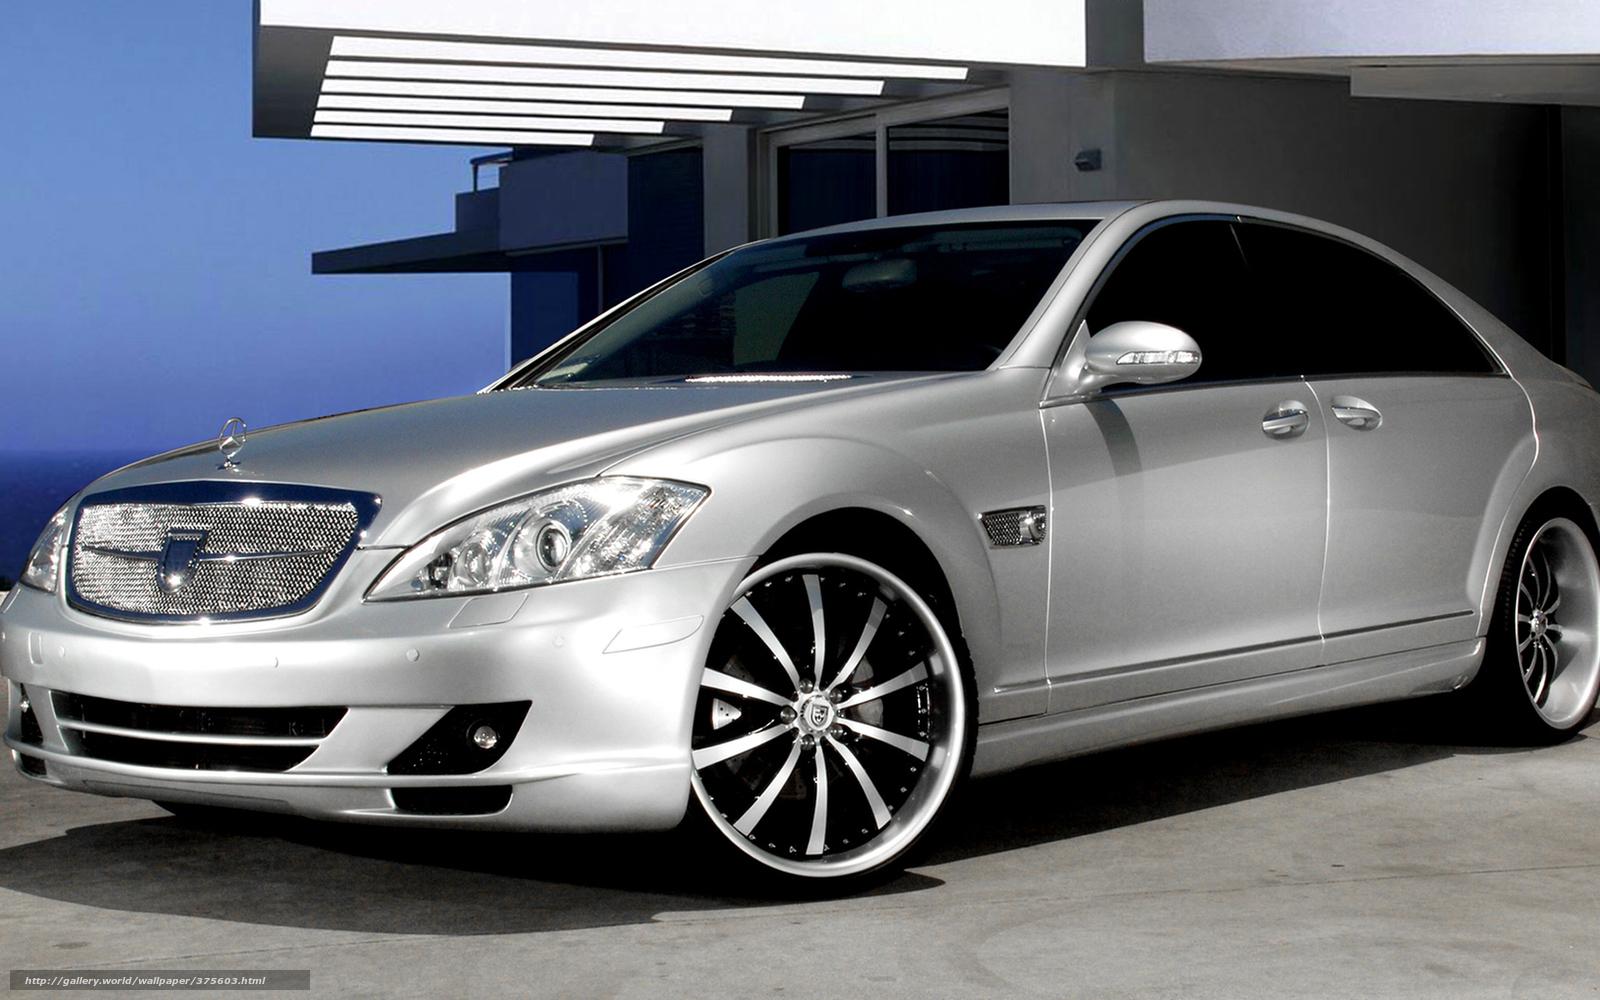 Mercedes c63 amg chrom : хромированный мерин из дубаи)))